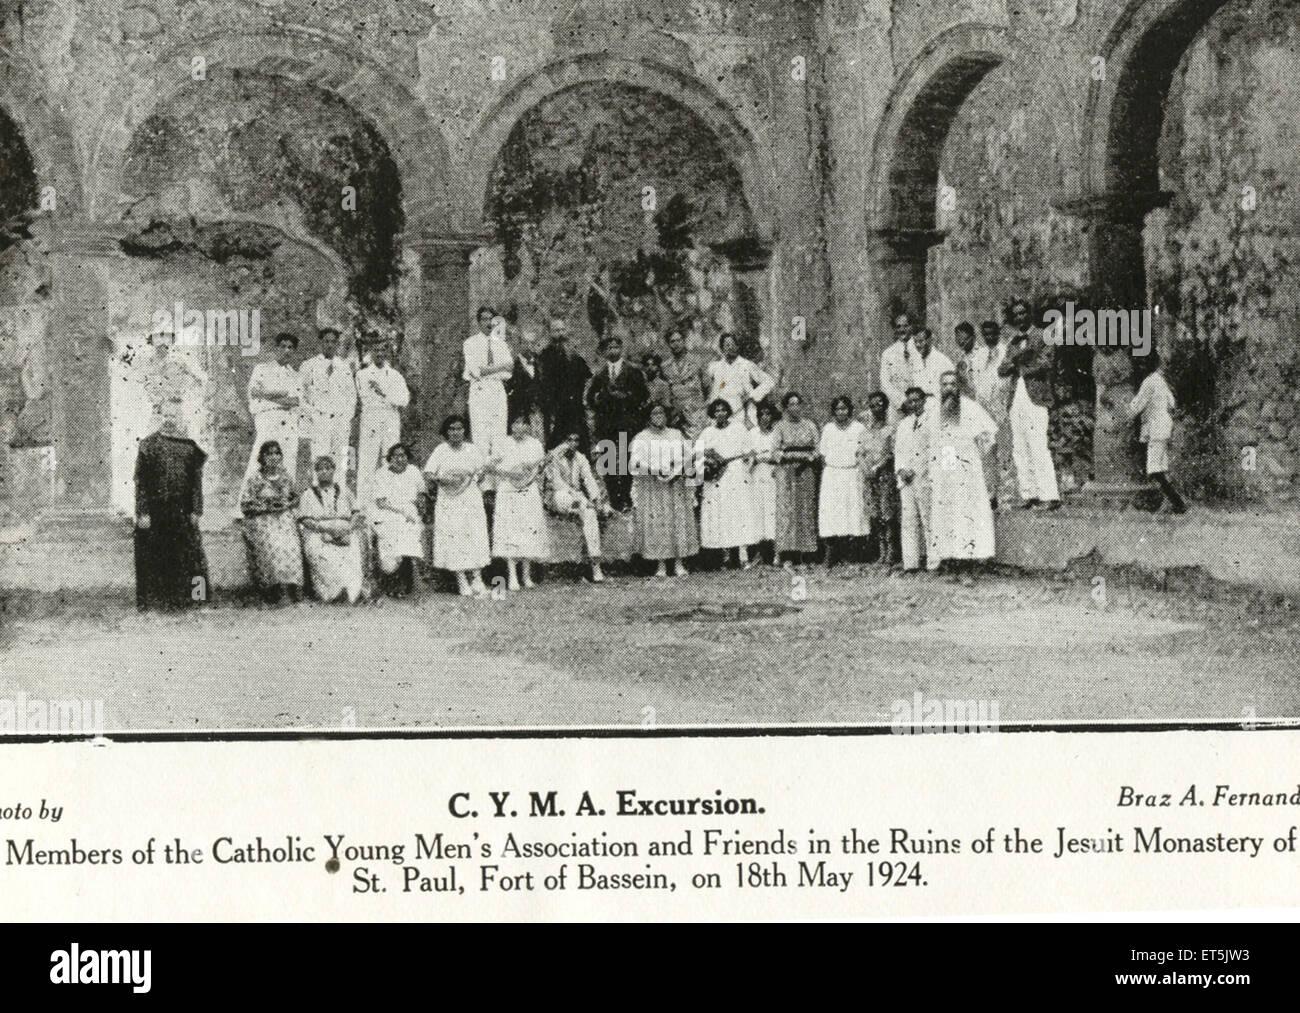 Catholic community excursion members of catholic young men's association Jesuit monastery of Bassein Vasai ; - Stock Image